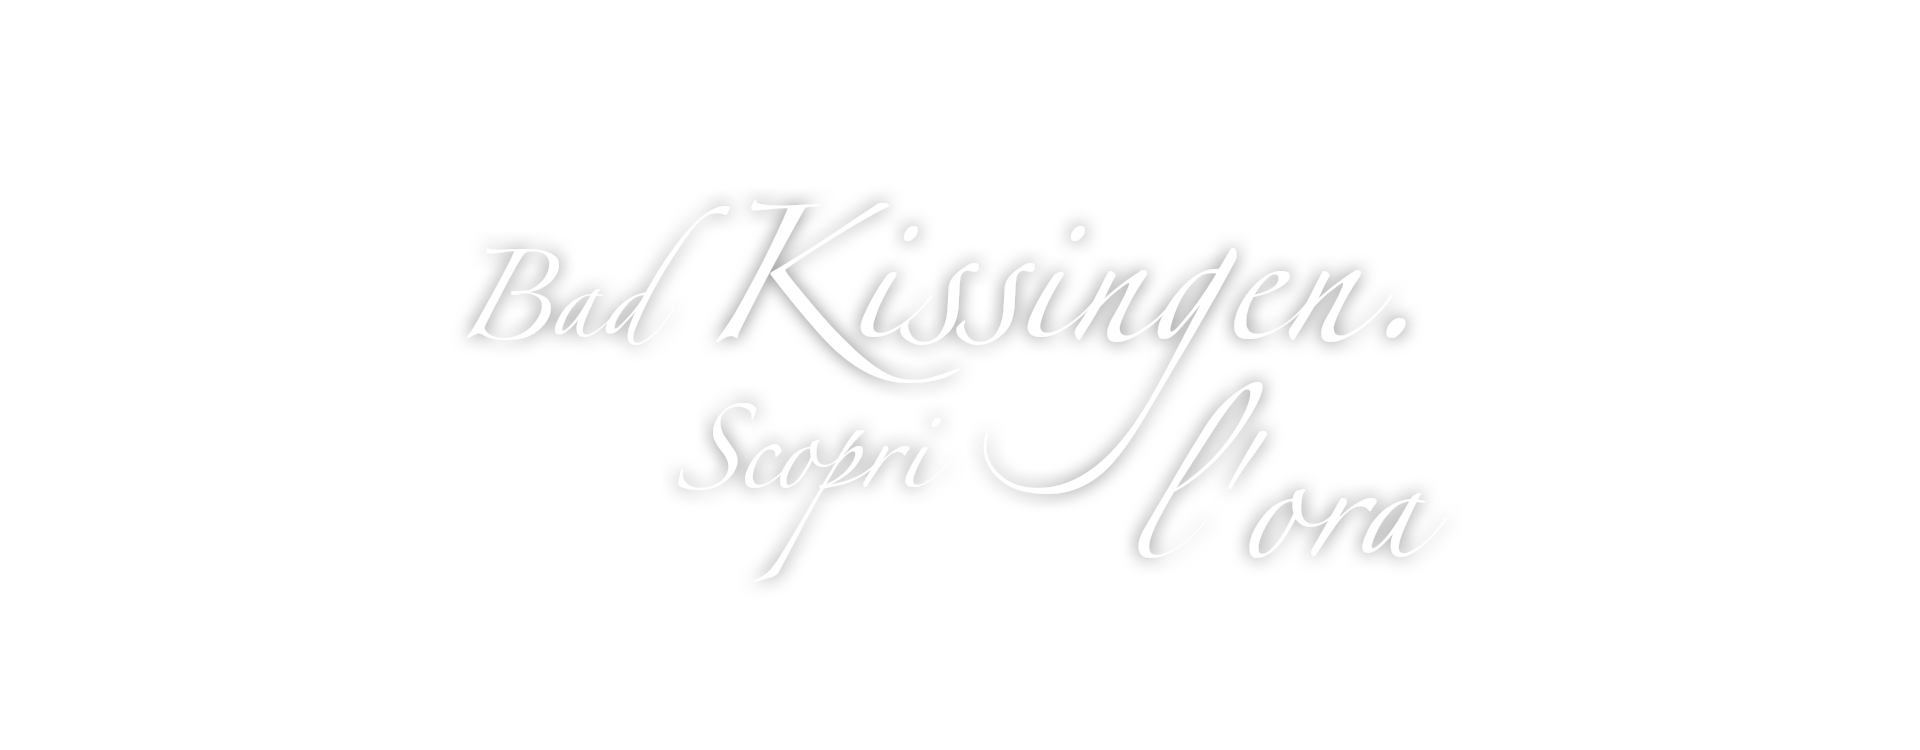 Claim Bad Kissingen 3